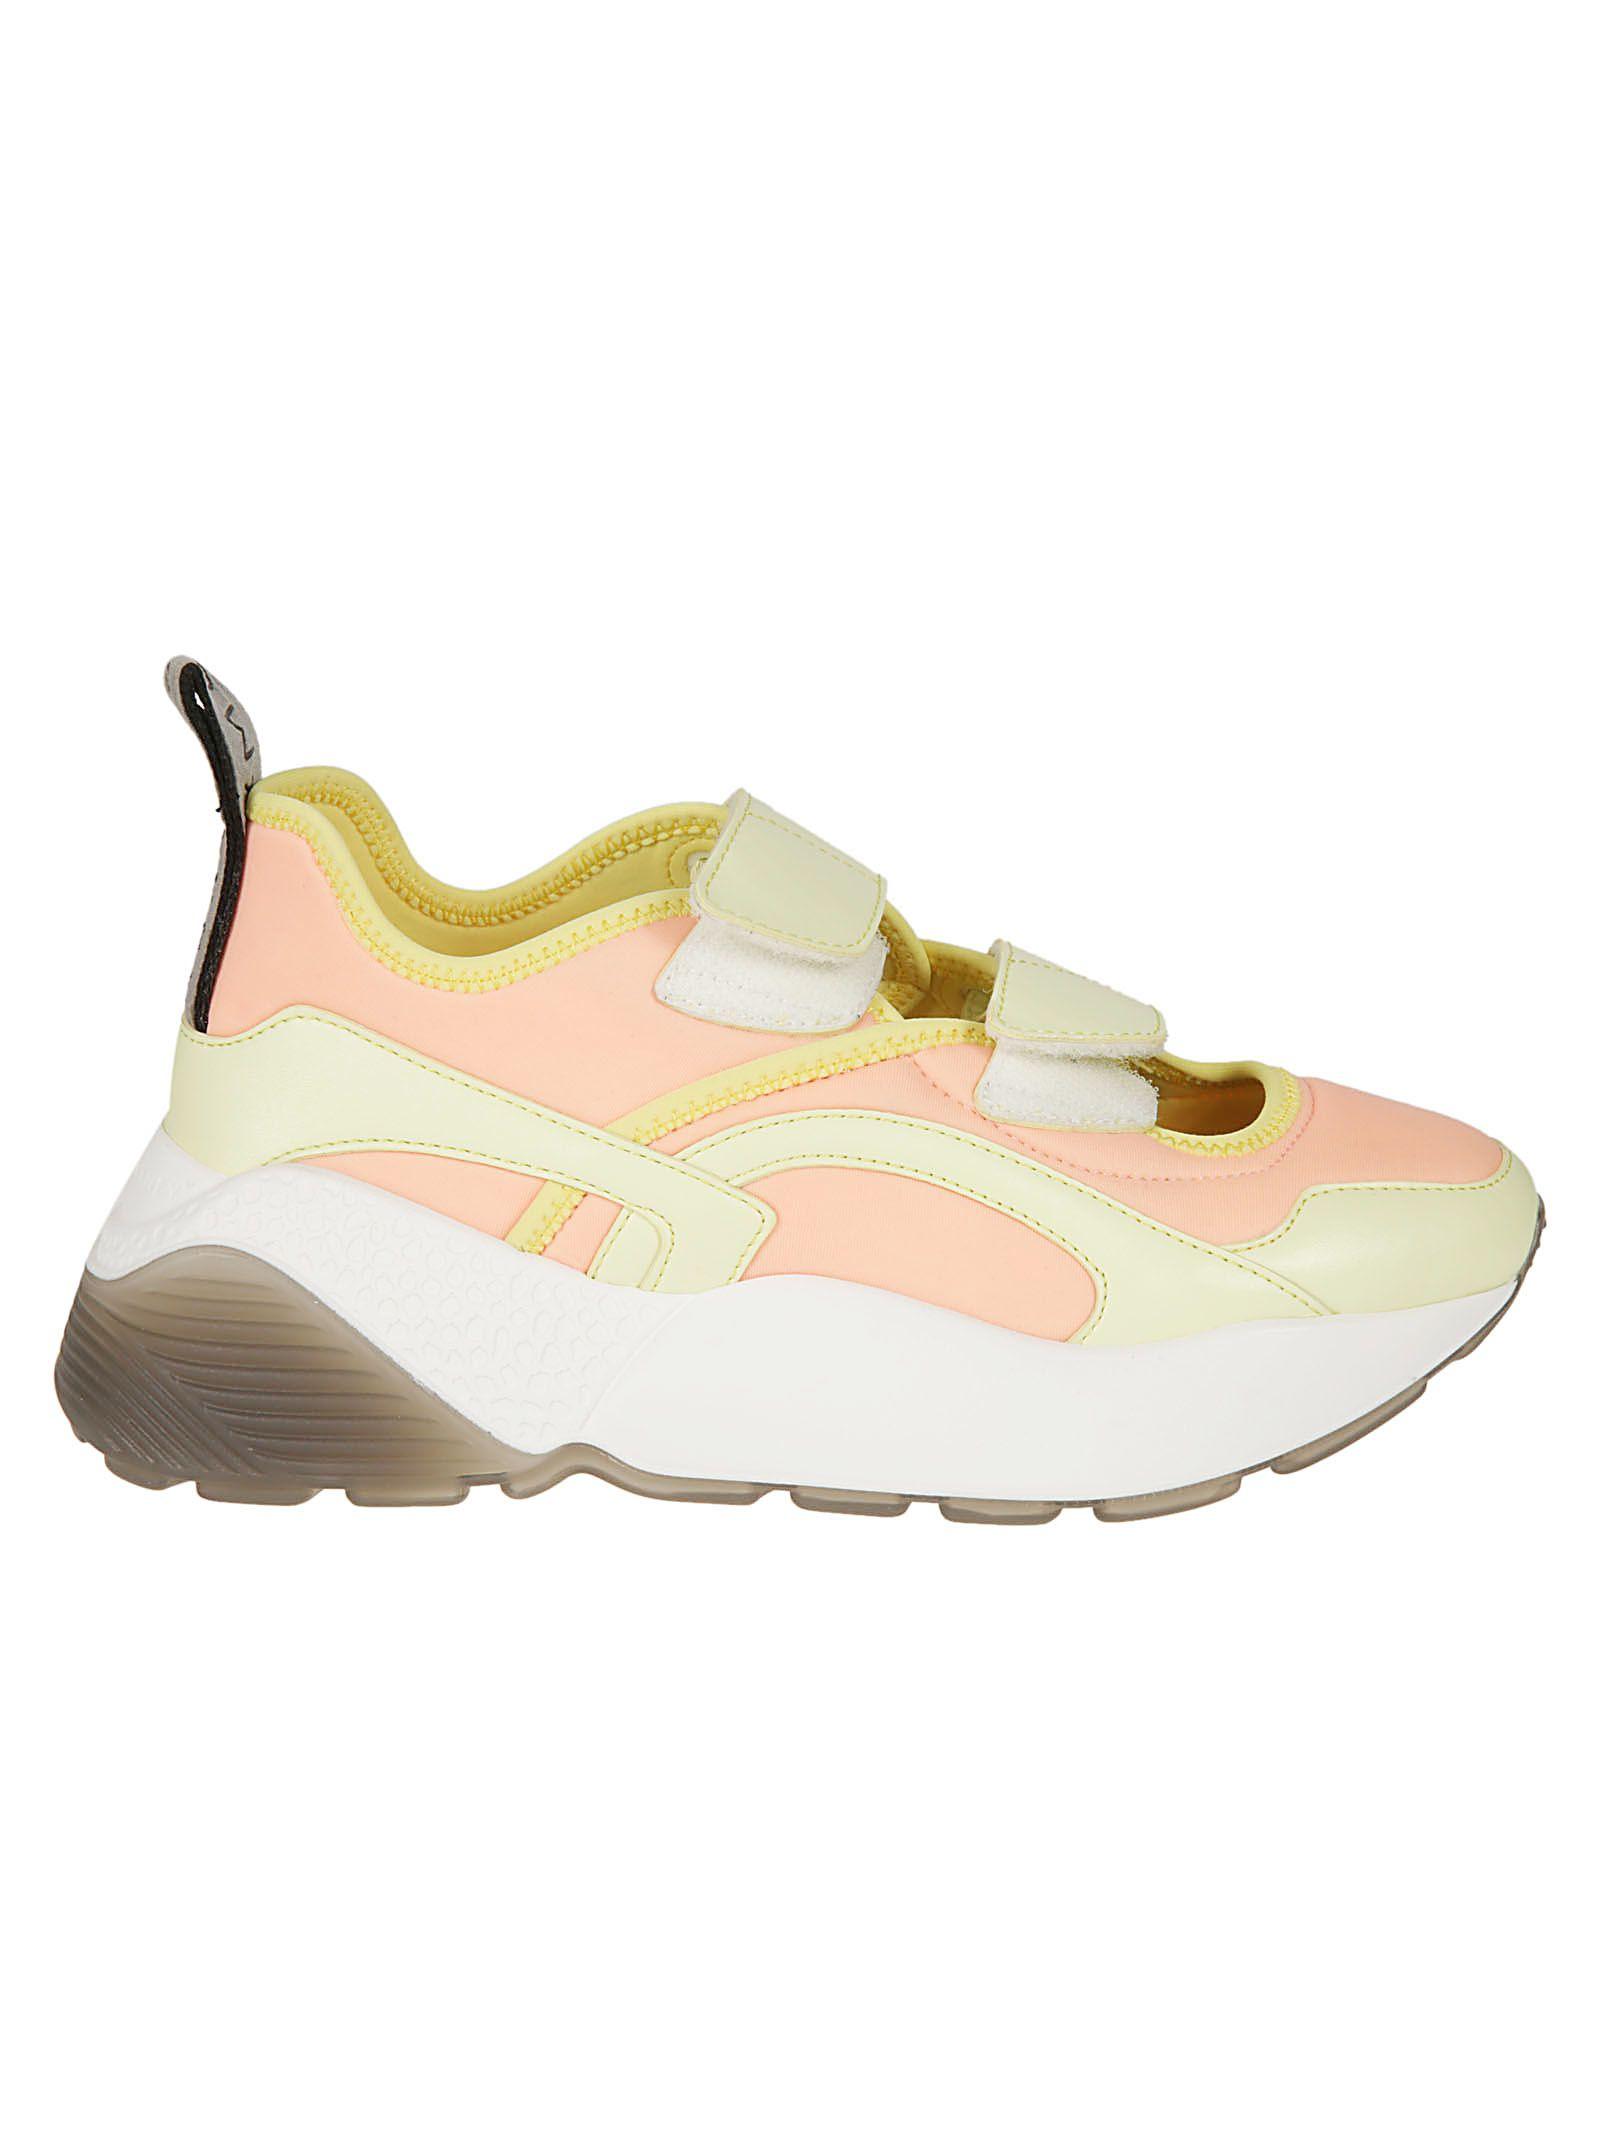 d0074b2a404c7 Stella McCartney Stella Mccartney Eclypse Sneakers - Ray rose cit a ...